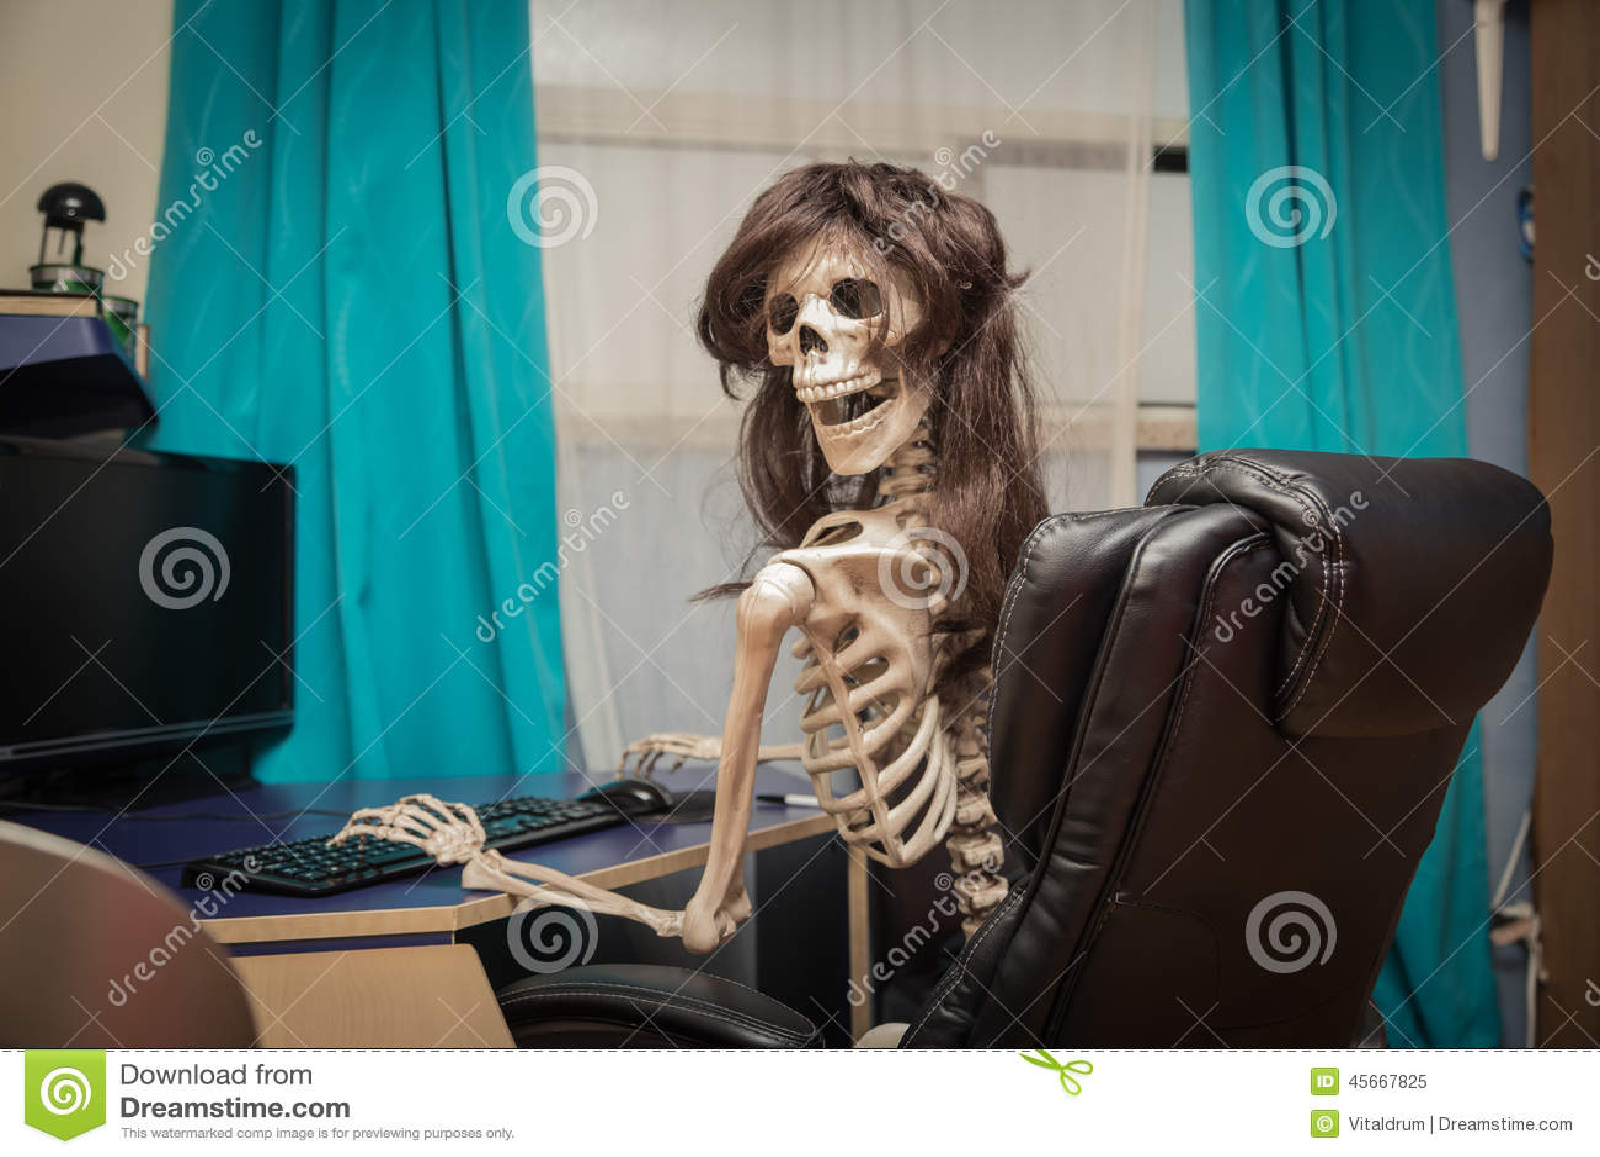 Skeleton In Office Chair Smiling skeleton in a wig sitting in room on